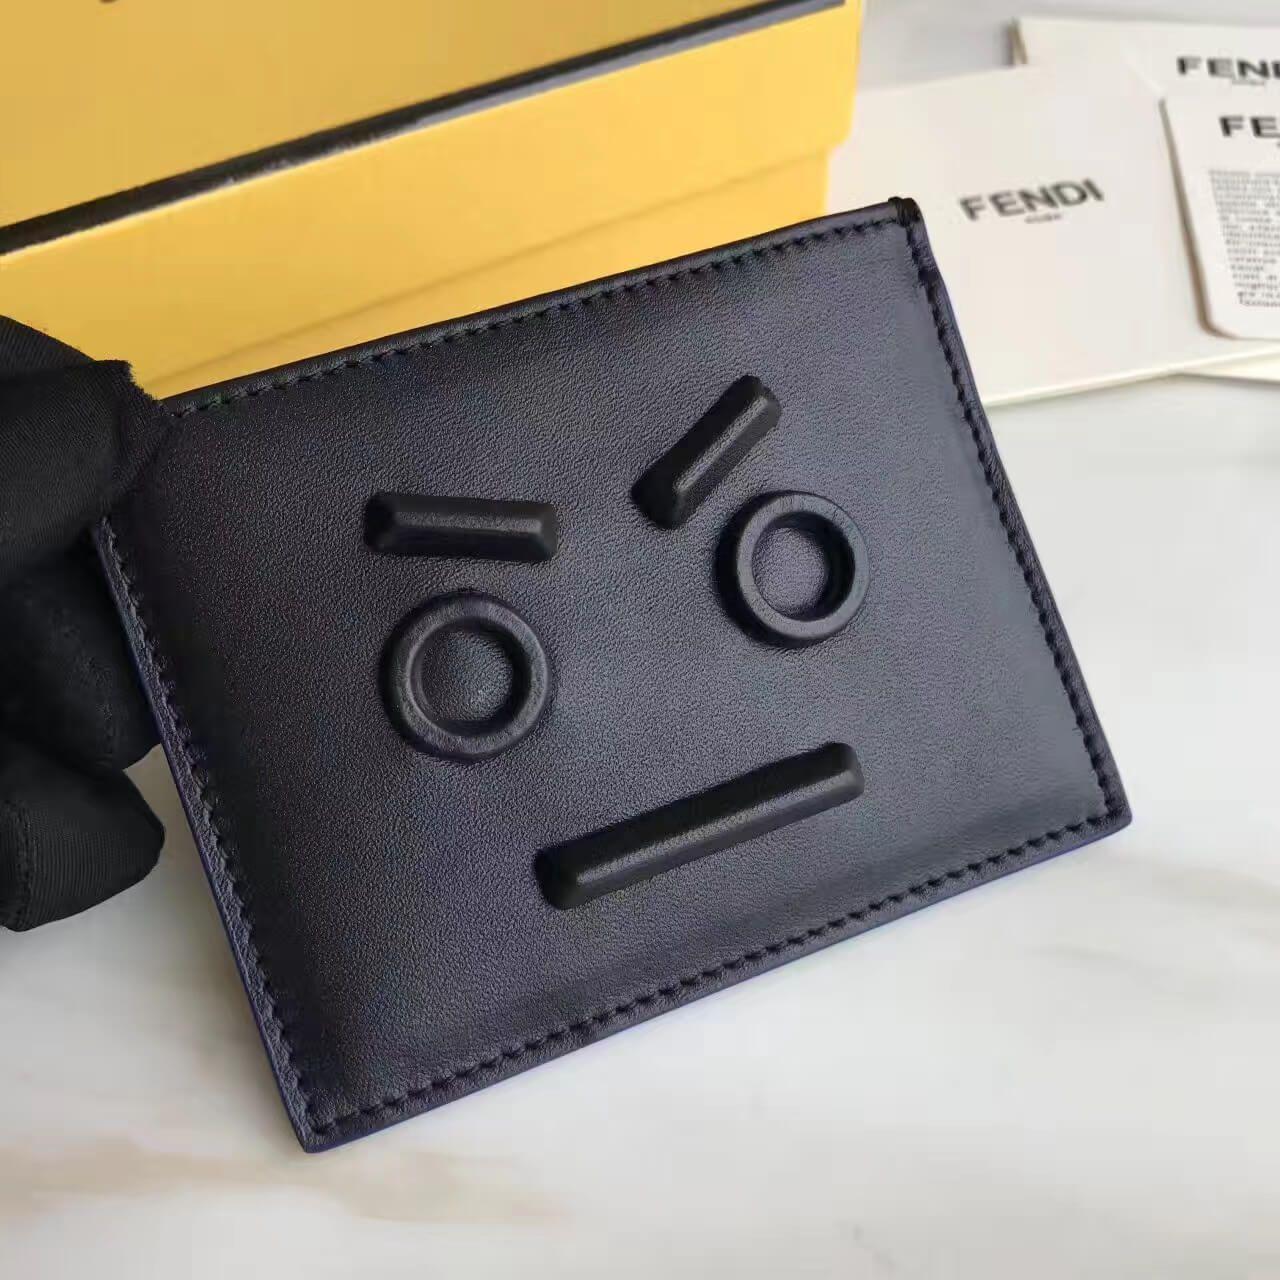 Fendi calfskin card threeslot card holder with no words